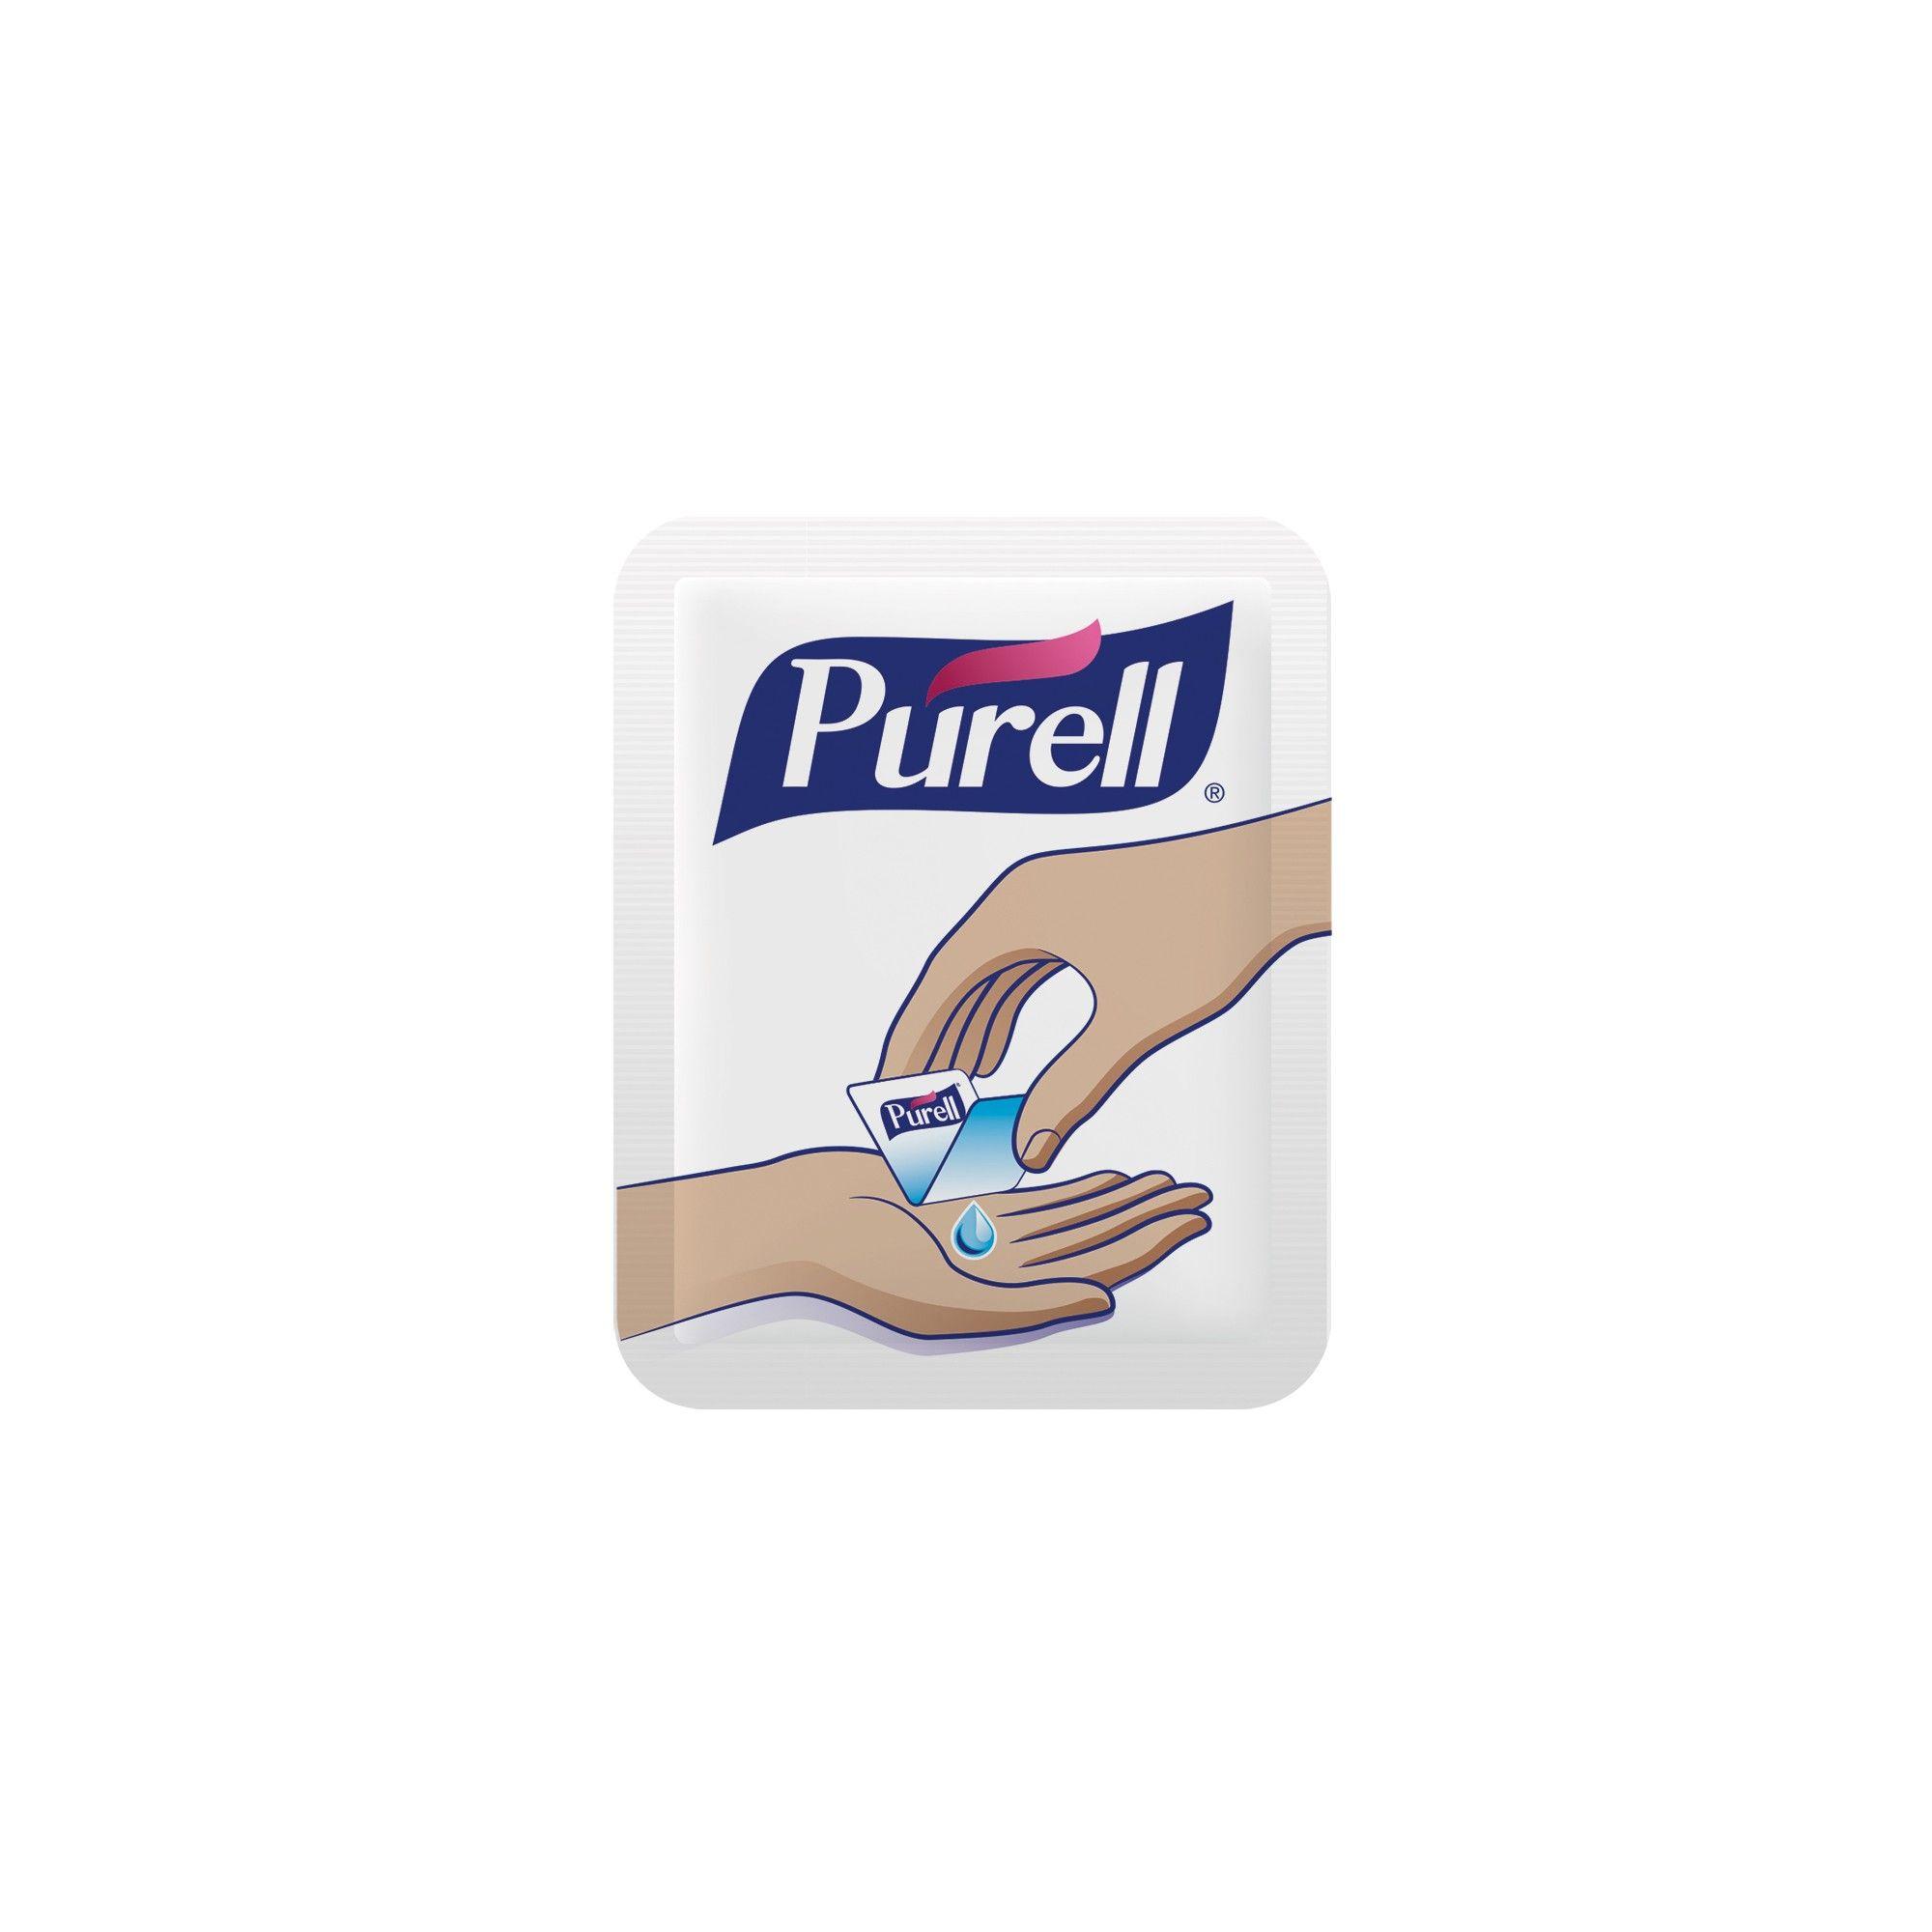 Purell Original Hand Sanitizer 24ct Hand Sanitizer How To